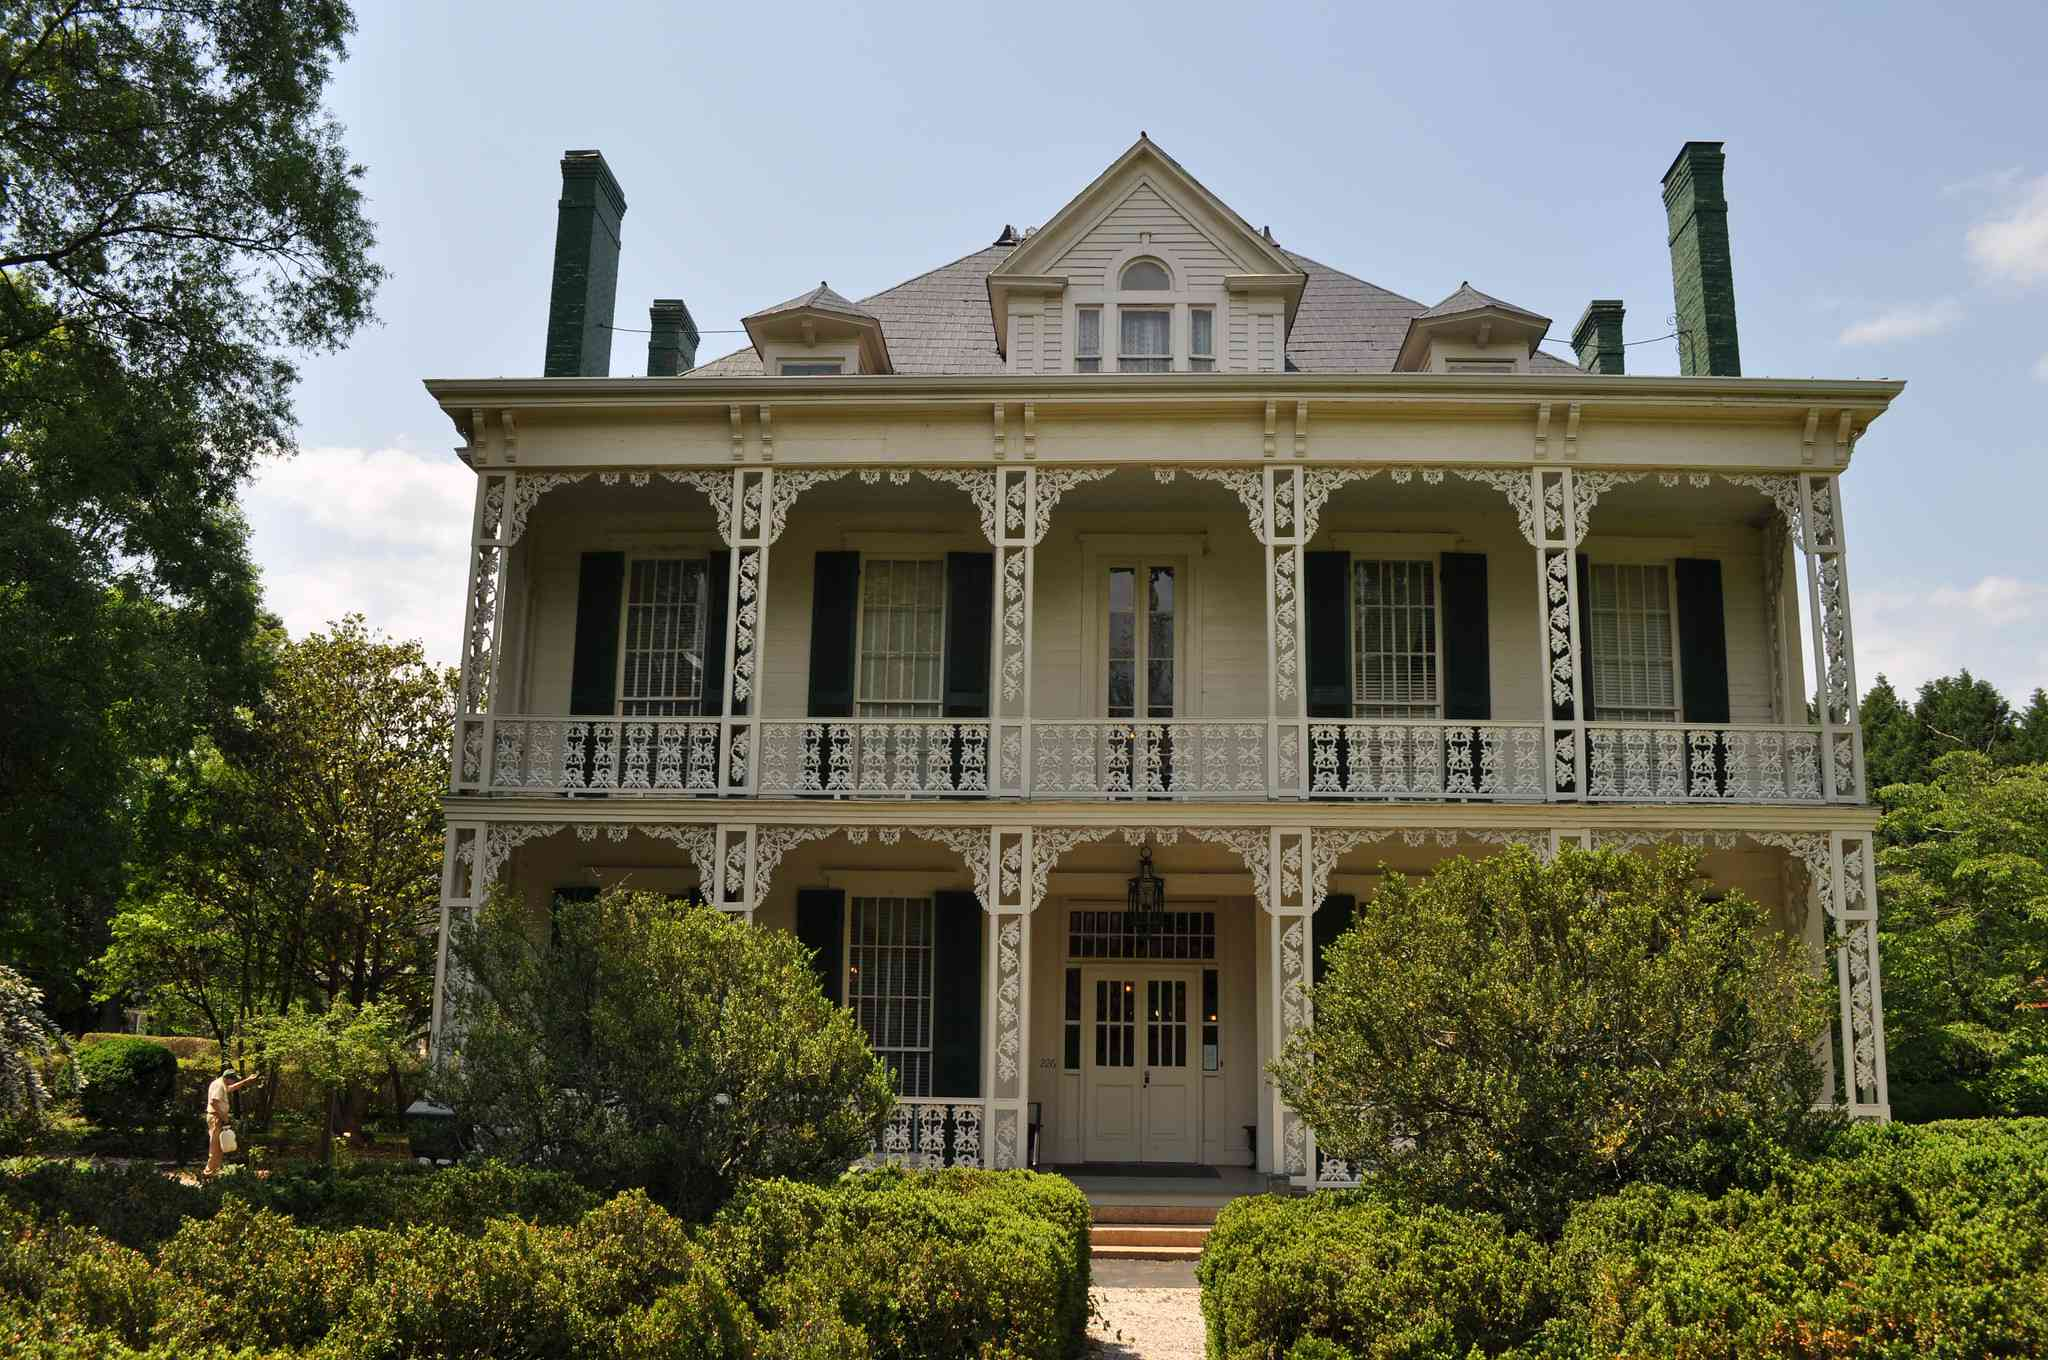 Dr Josephus Hall House